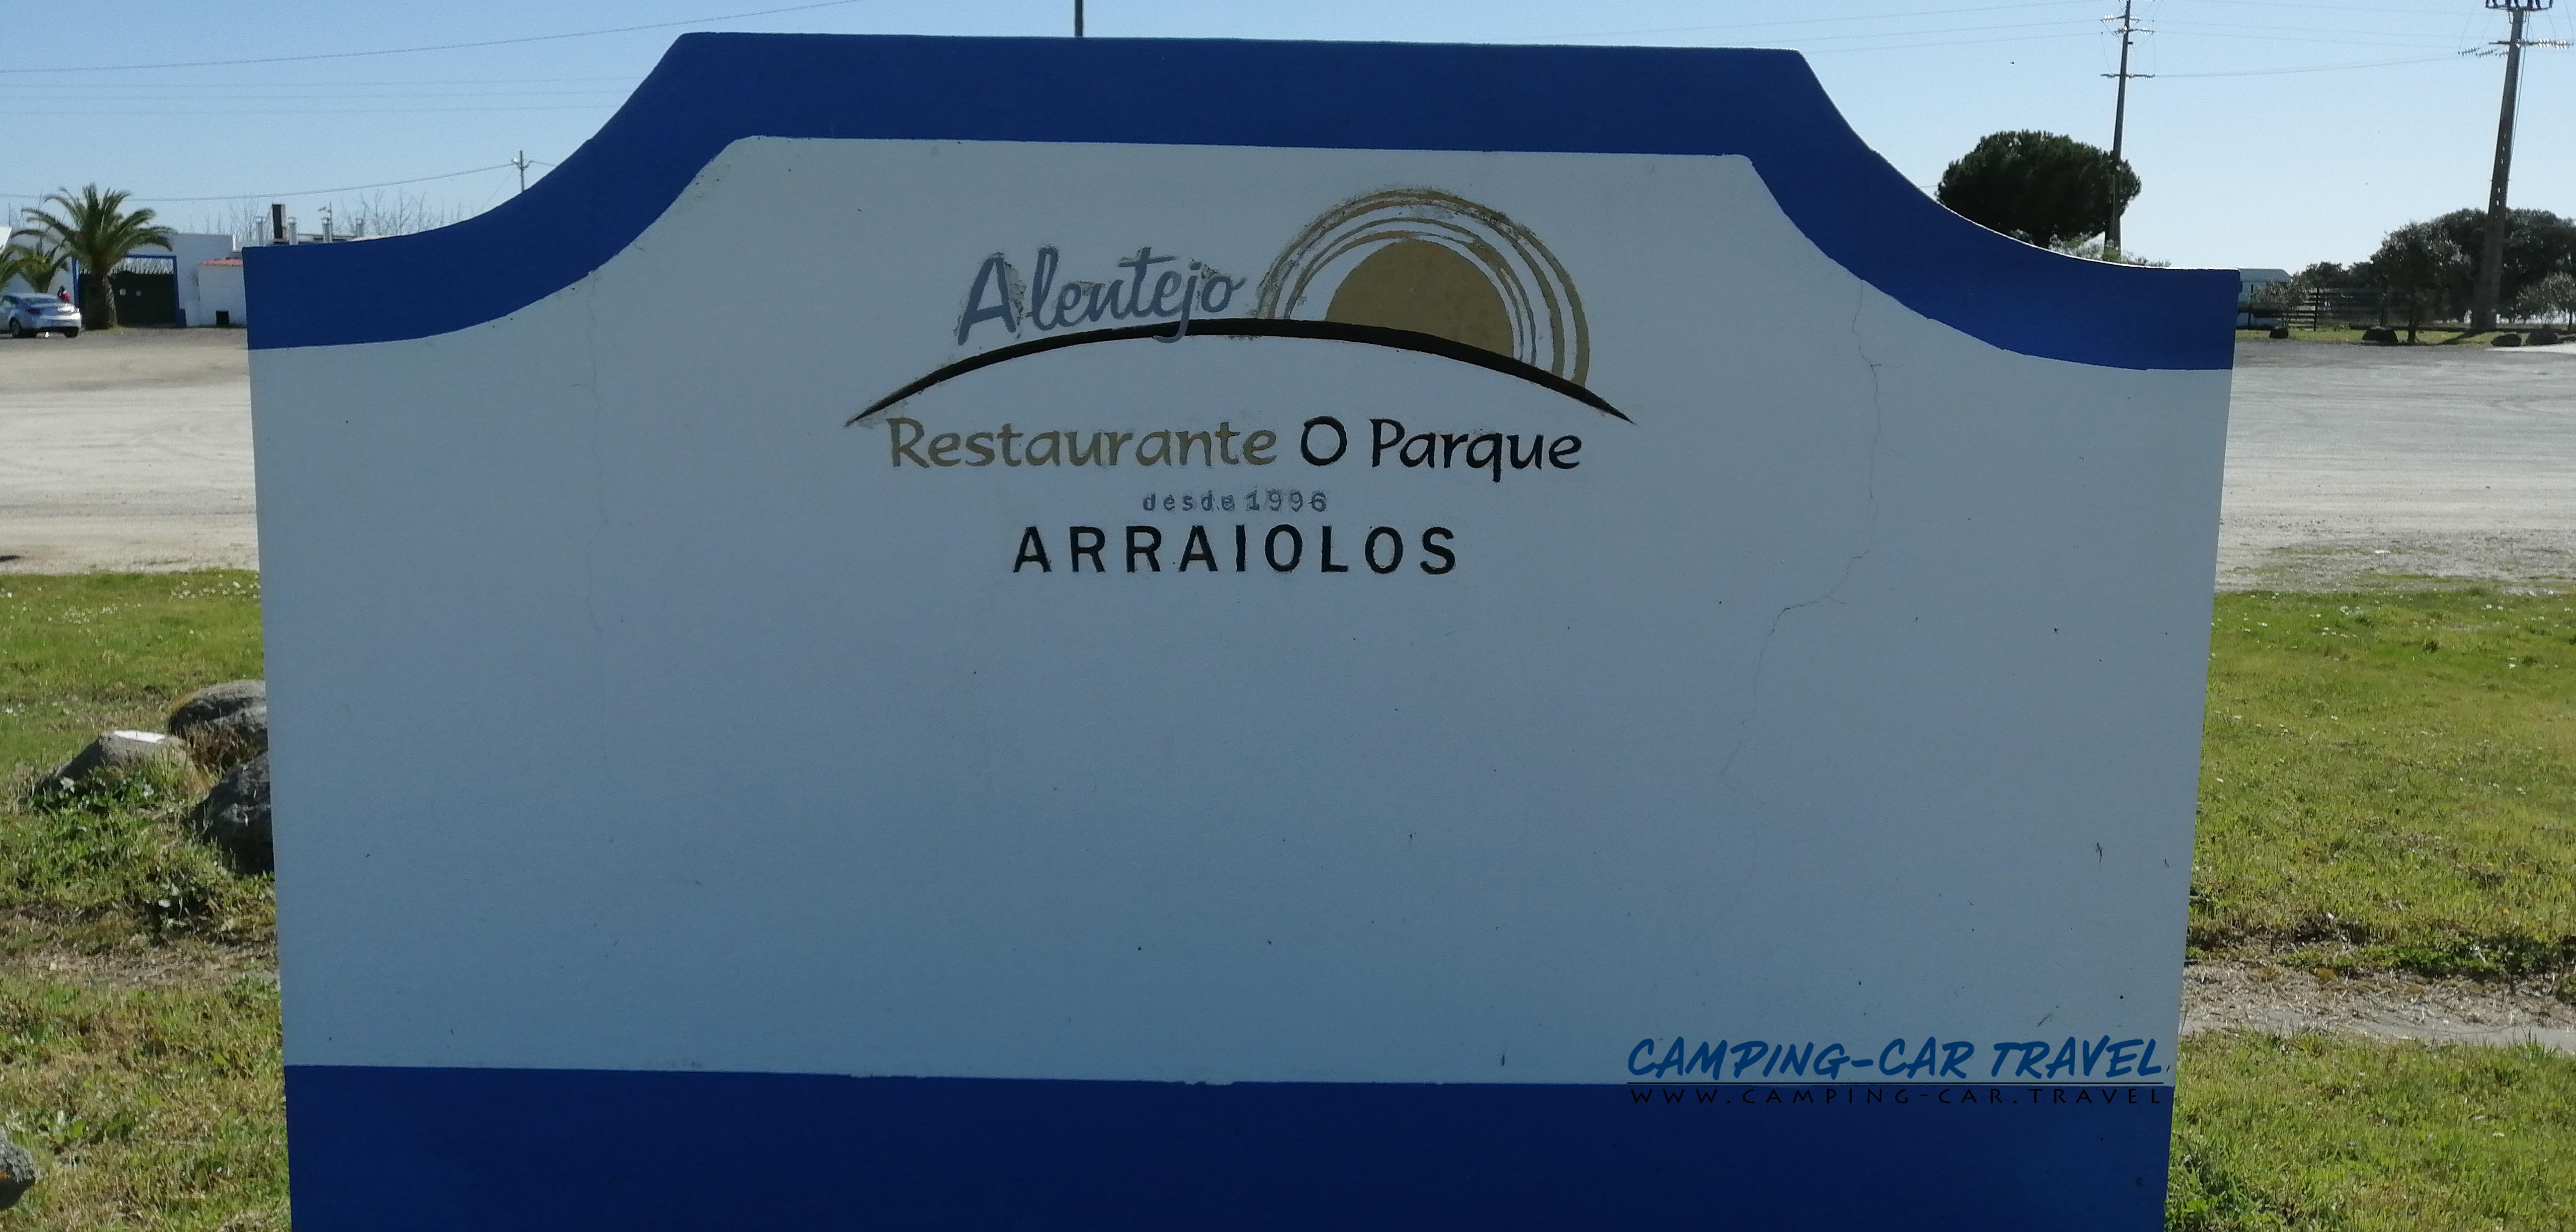 aire services camping car Arraiolos Portugal